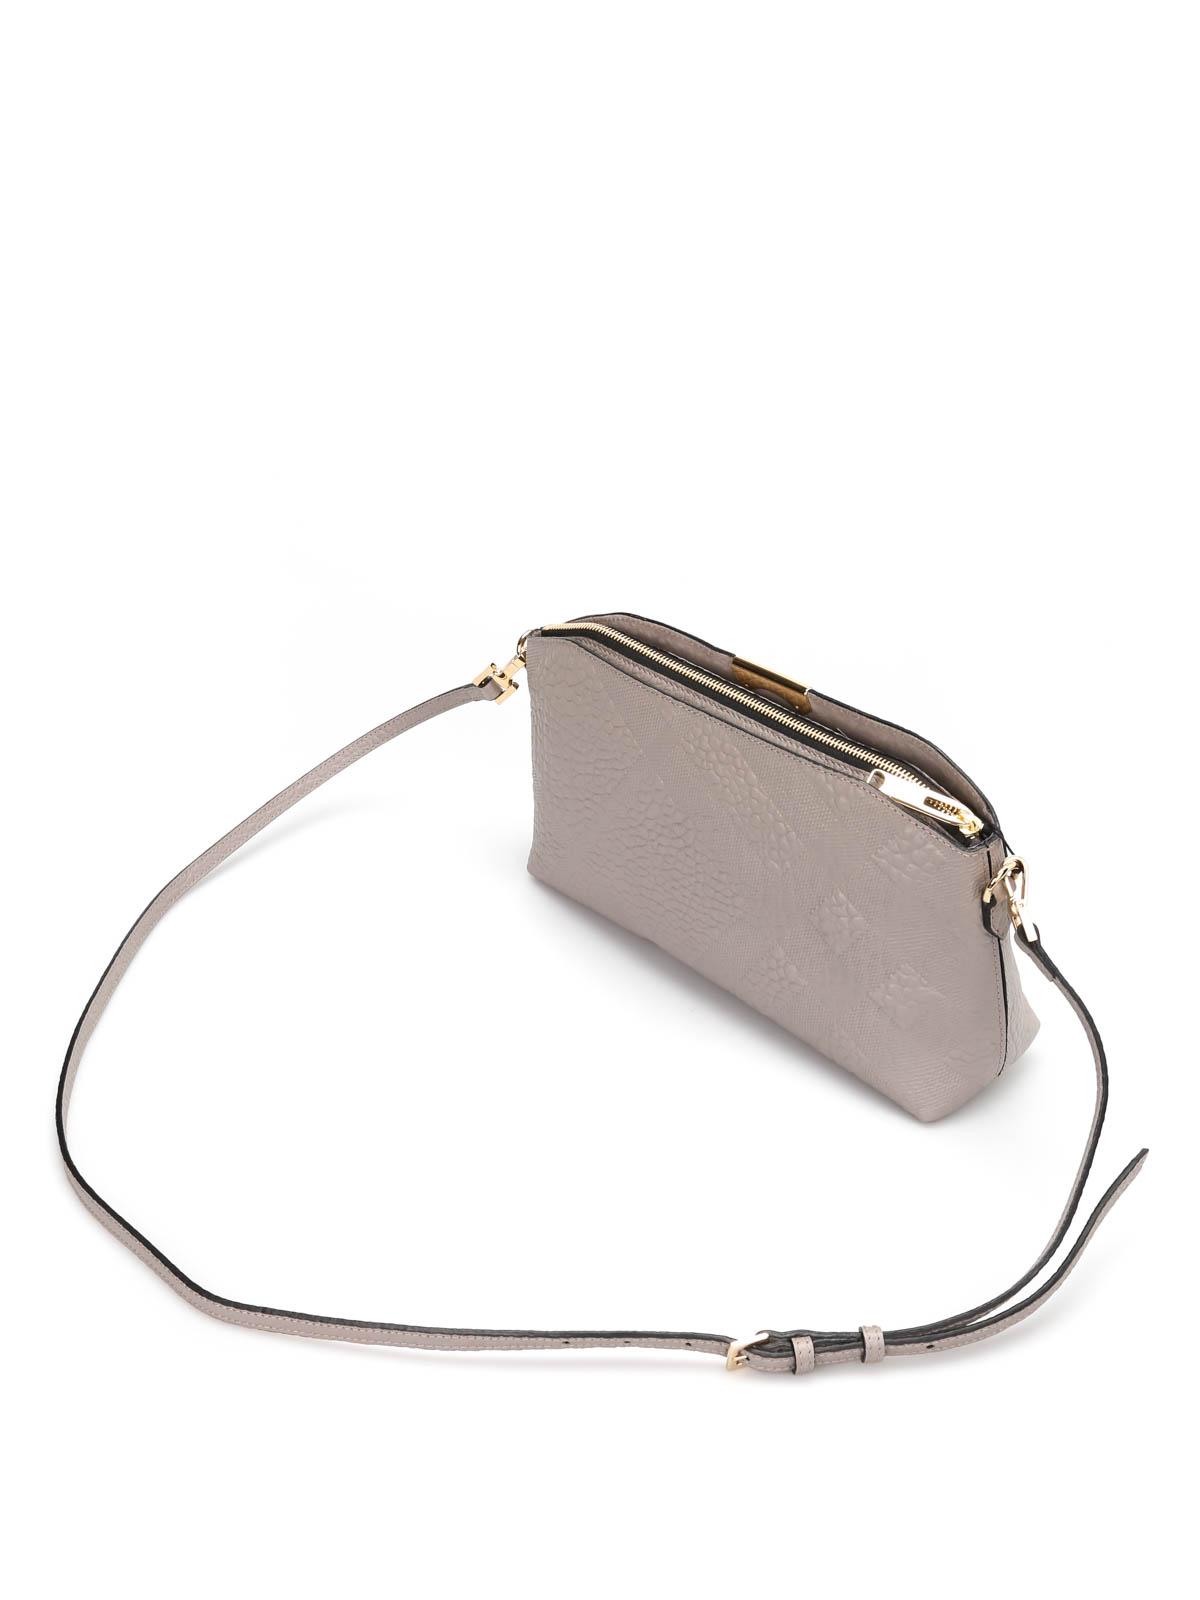 burberry handbag outlet wrsm  burberry handbag outlet